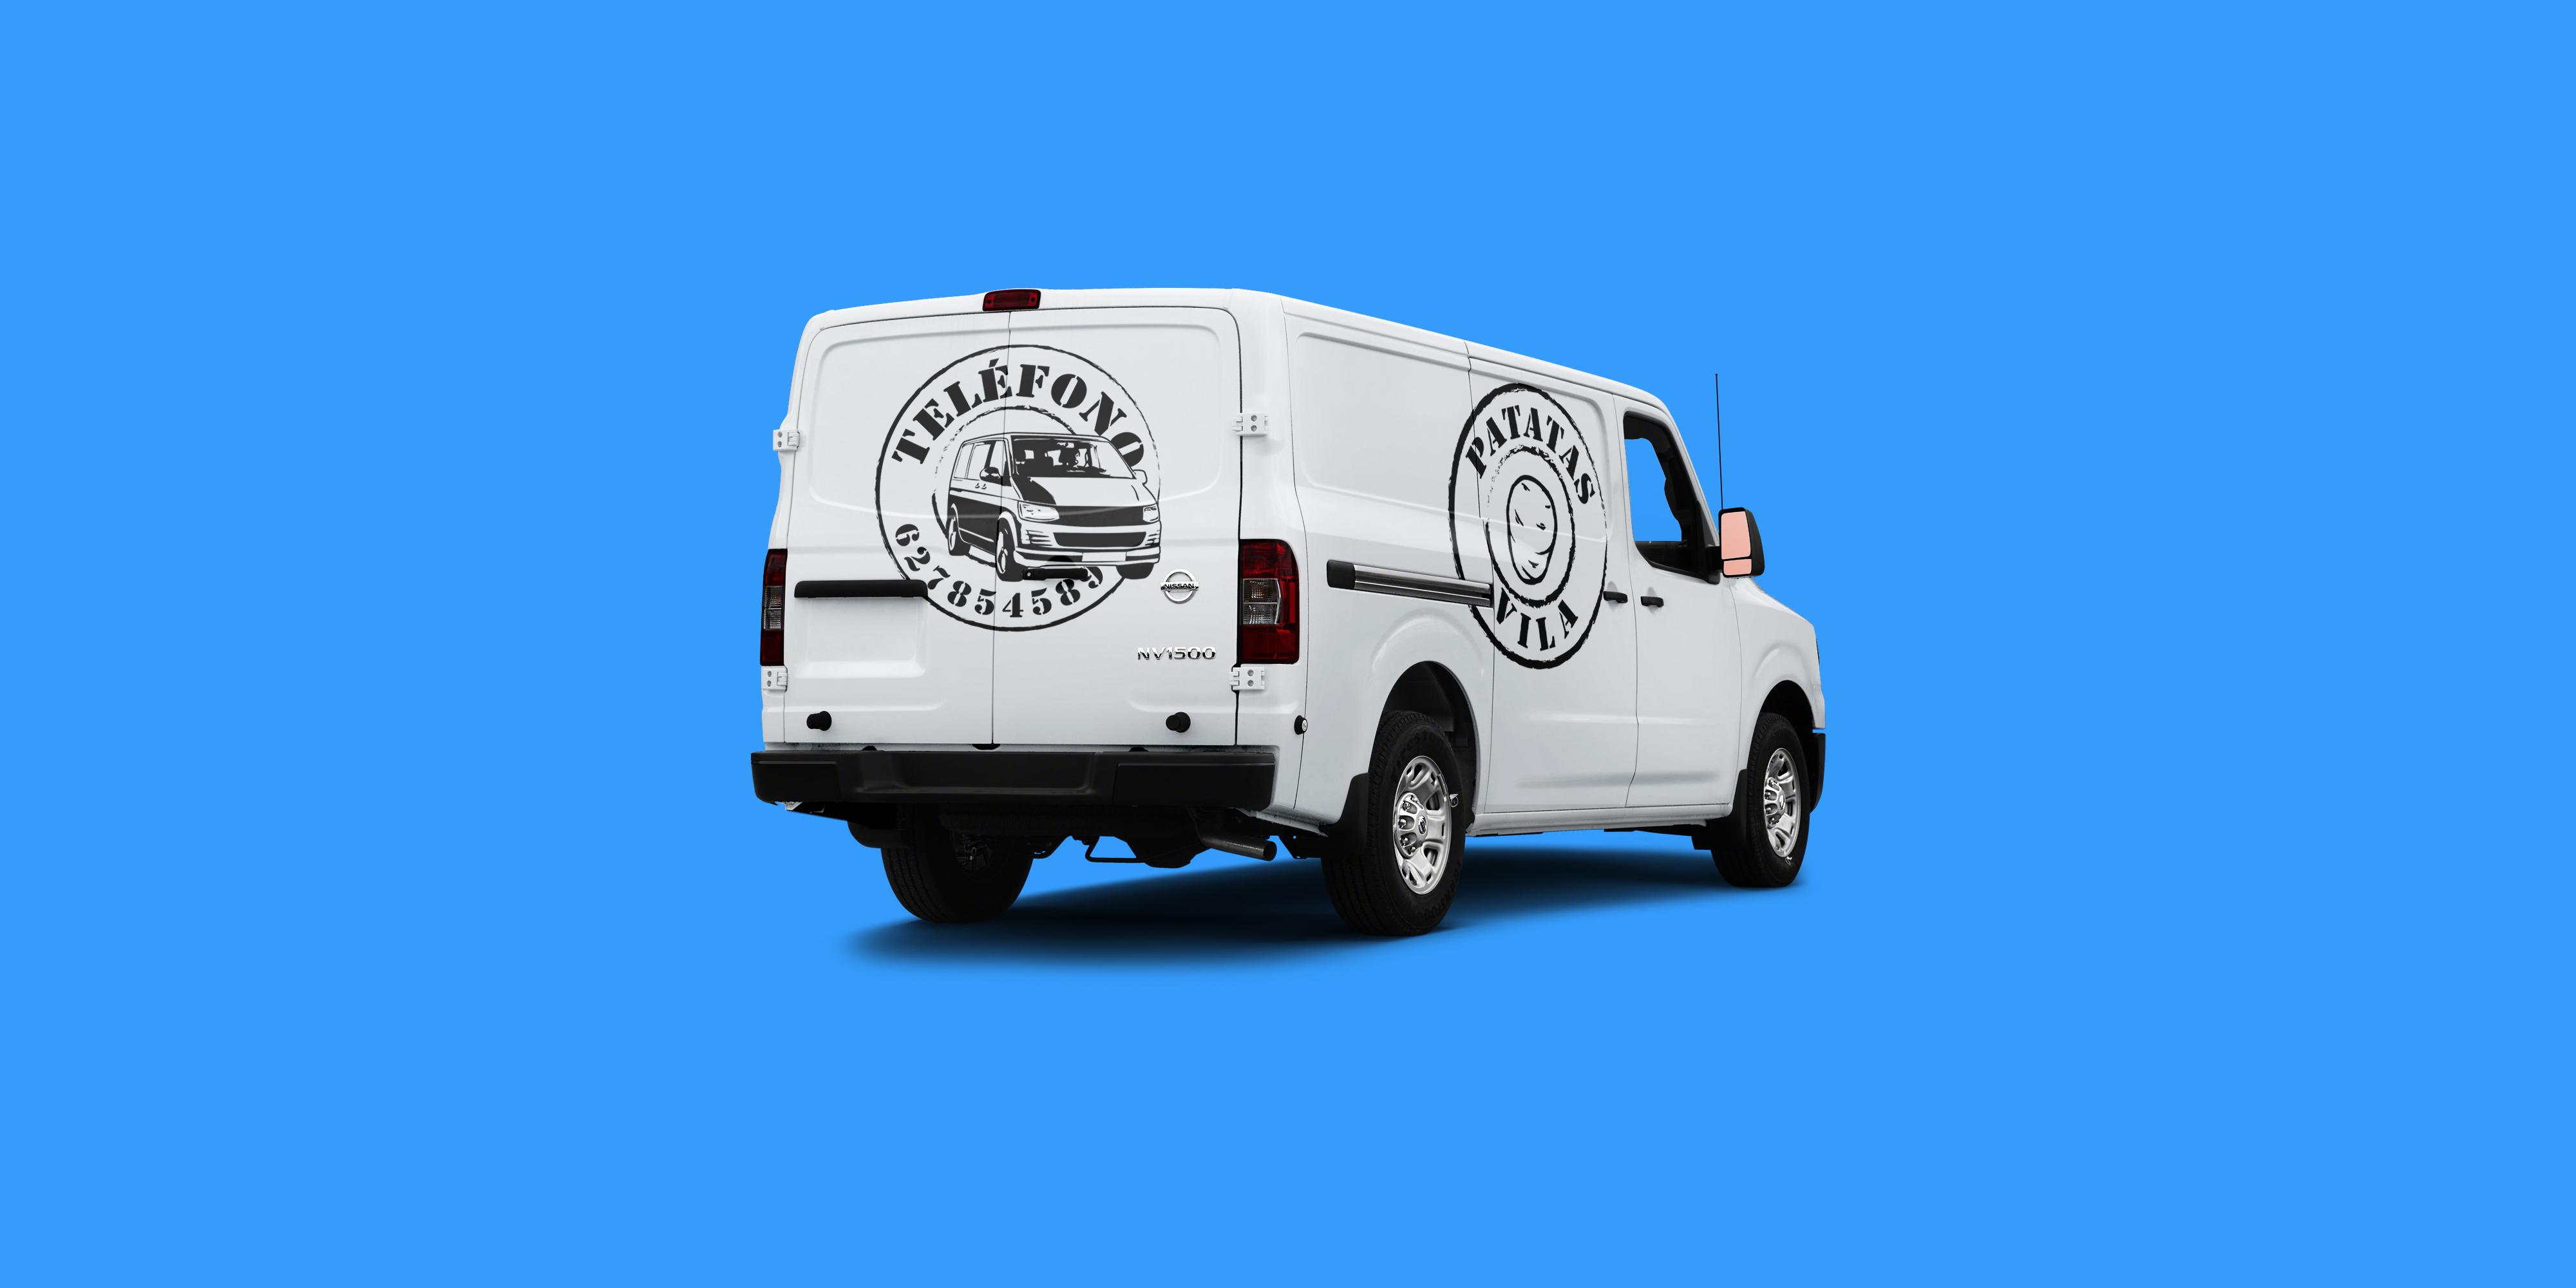 Company's Van.